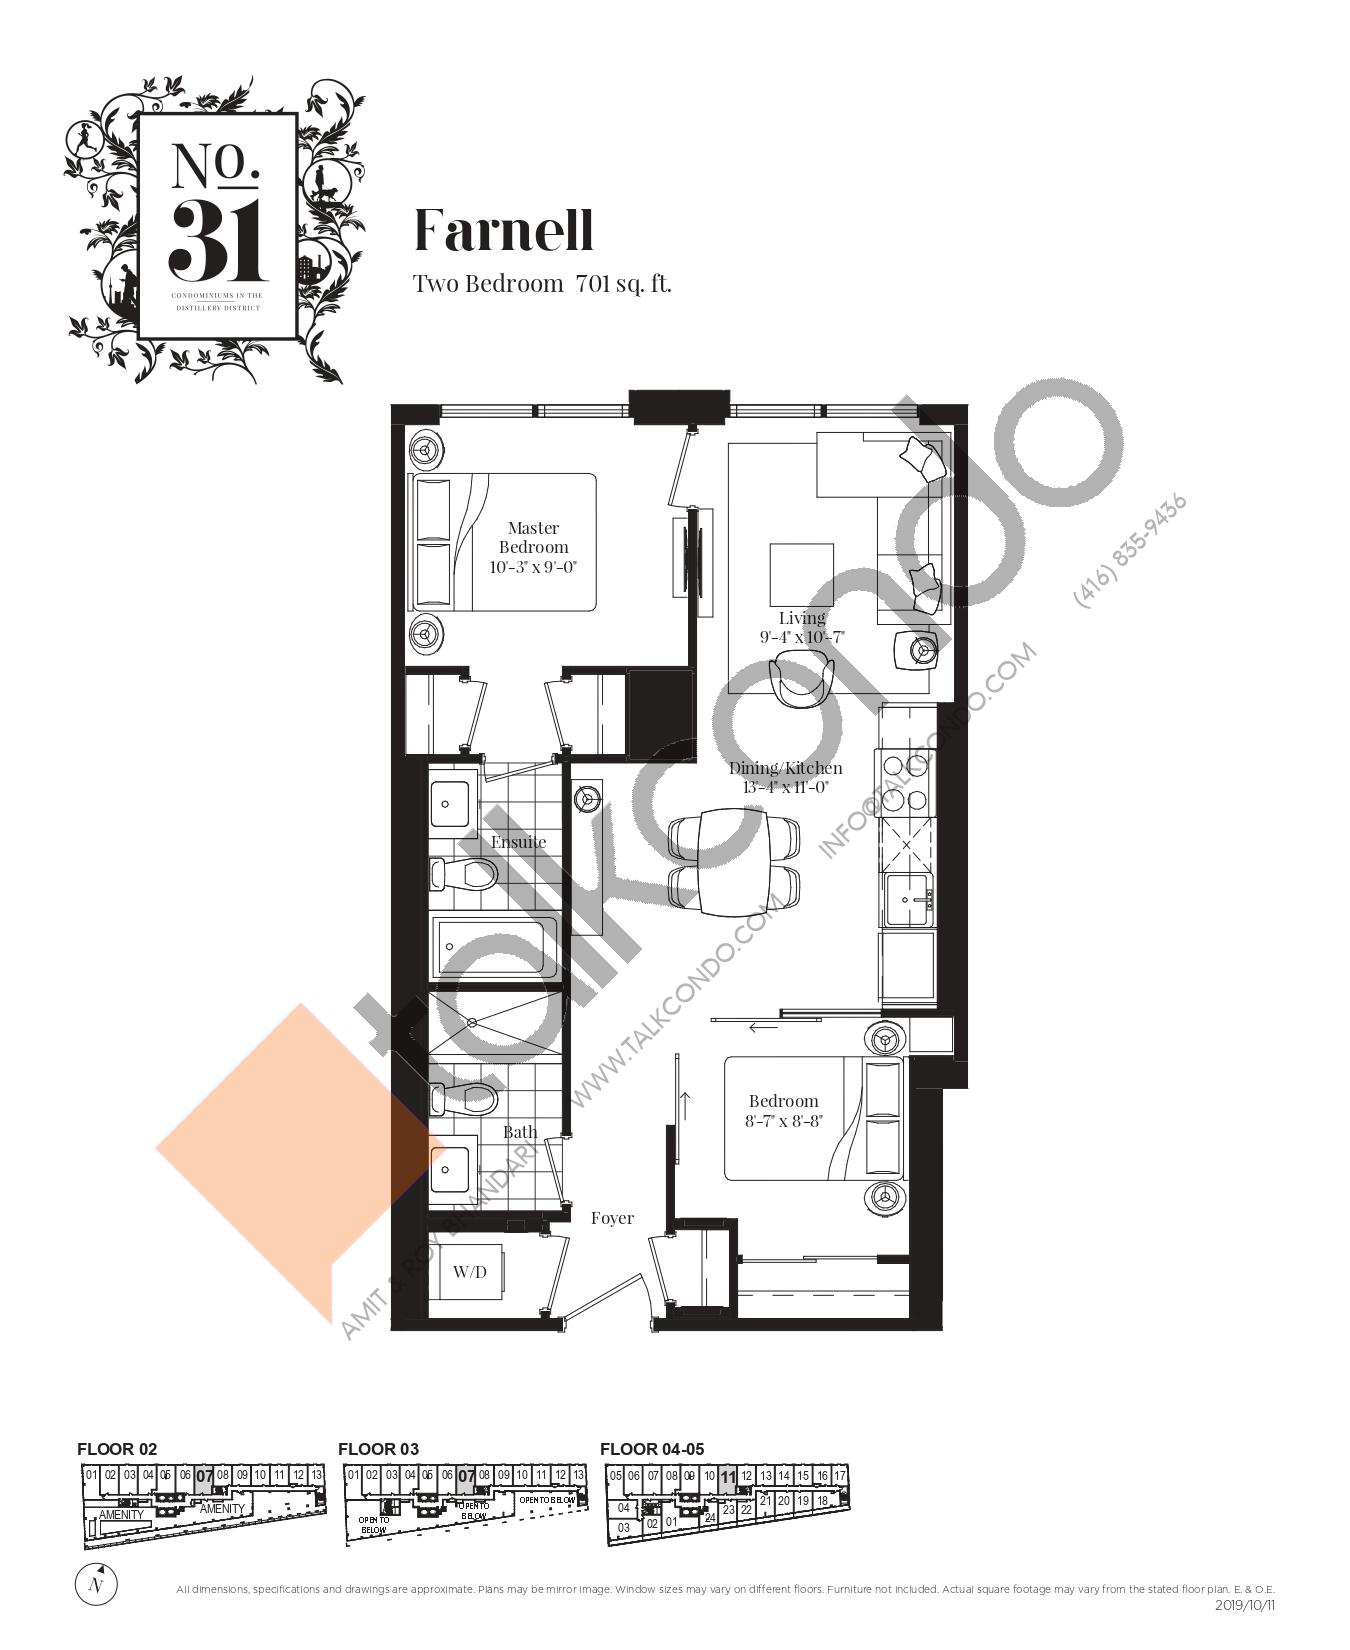 Farnell Floor Plan at No. 31 Condos - 701 sq.ft